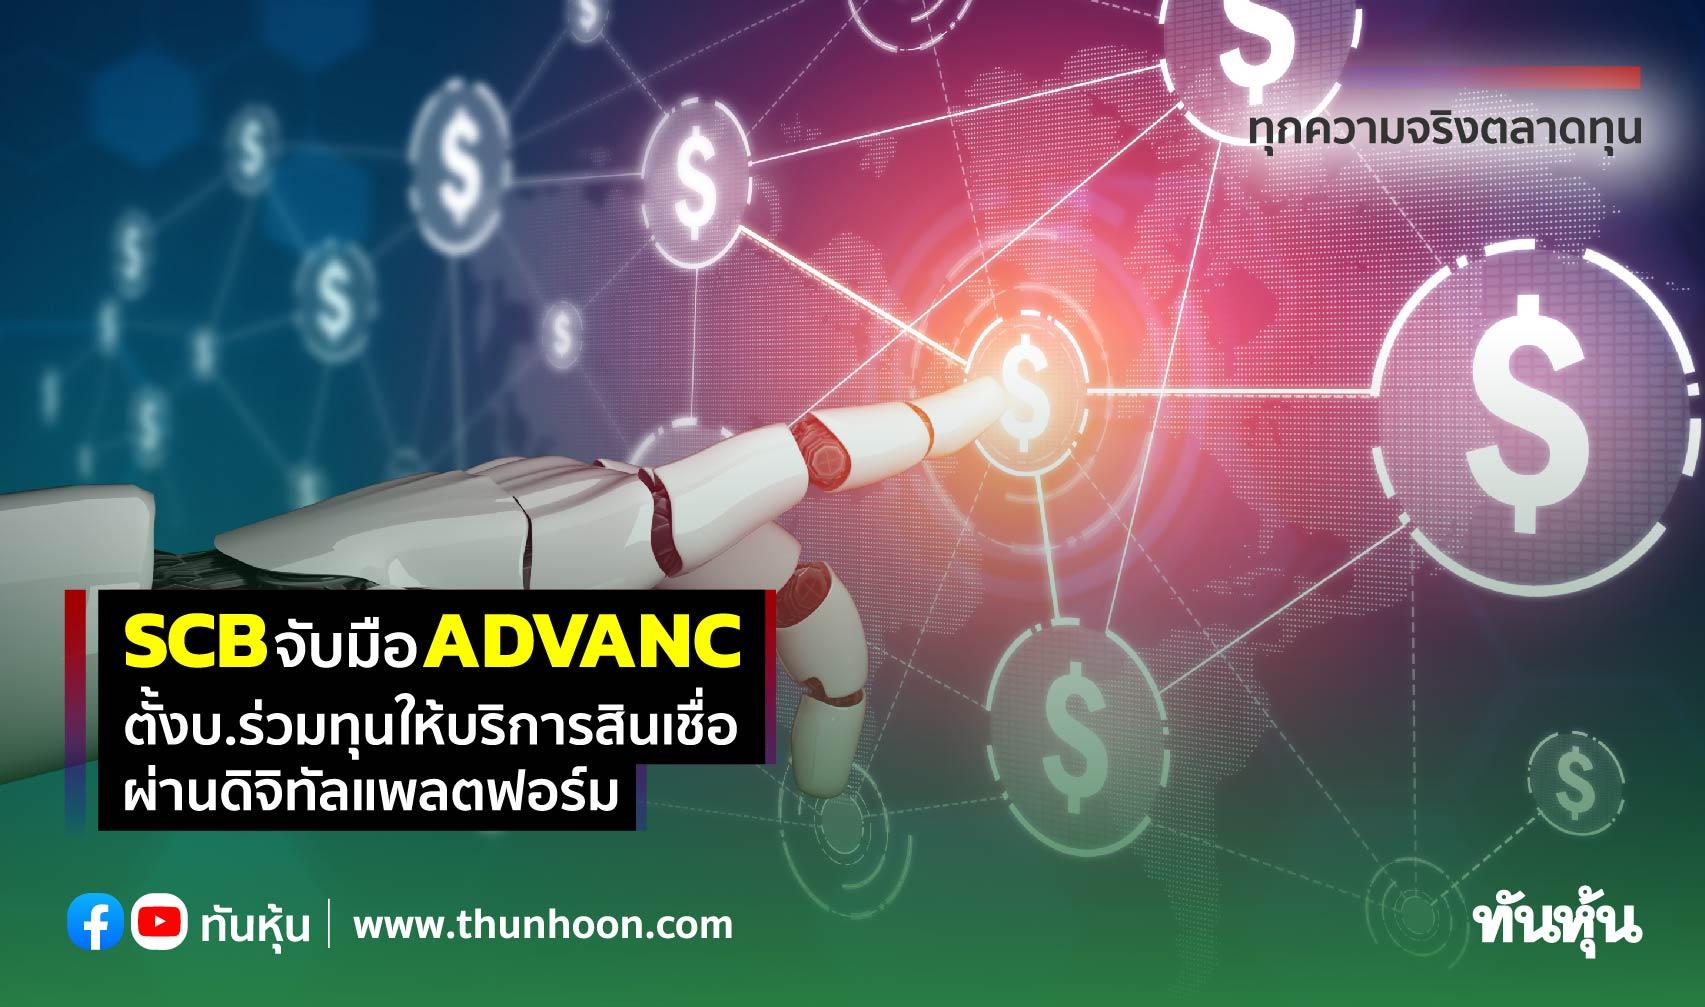 SCB จับมือ ADVANC ตั้งบ.ร่วมทุนให้บริการสินเชื่อผ่านดิจิทัลแพลตฟอร์ม